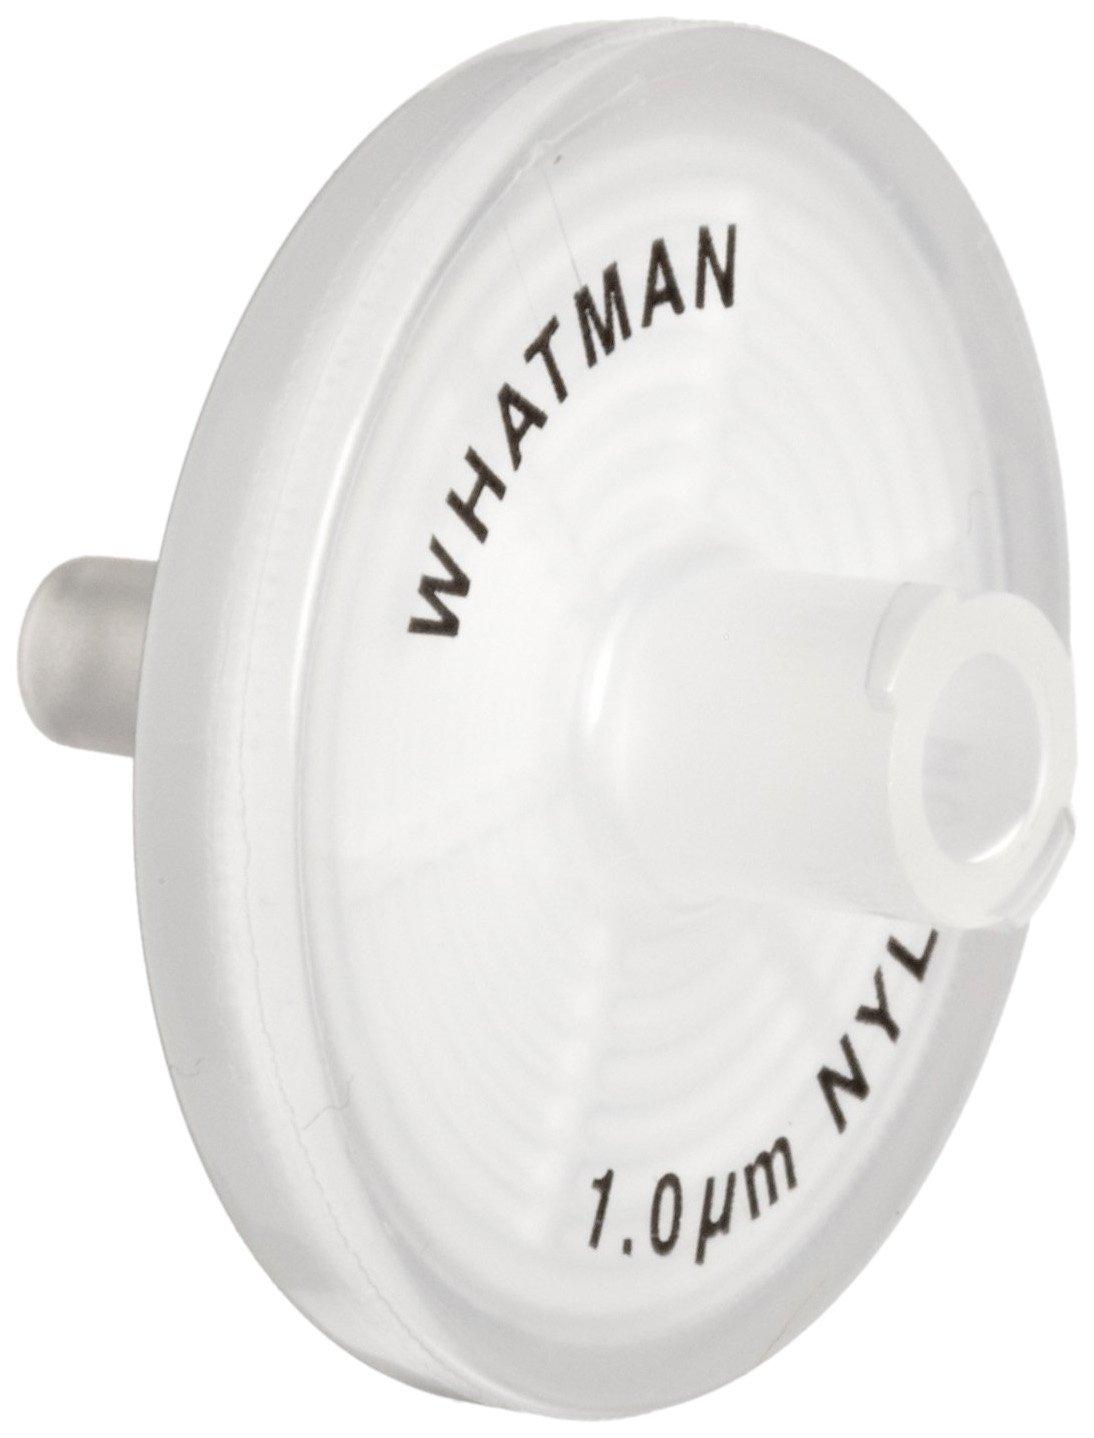 Whatman 6750-2510 Nylon Puradisc 25 Syringe Filter, 1.0 Micron (Pack of 50) by Whatman